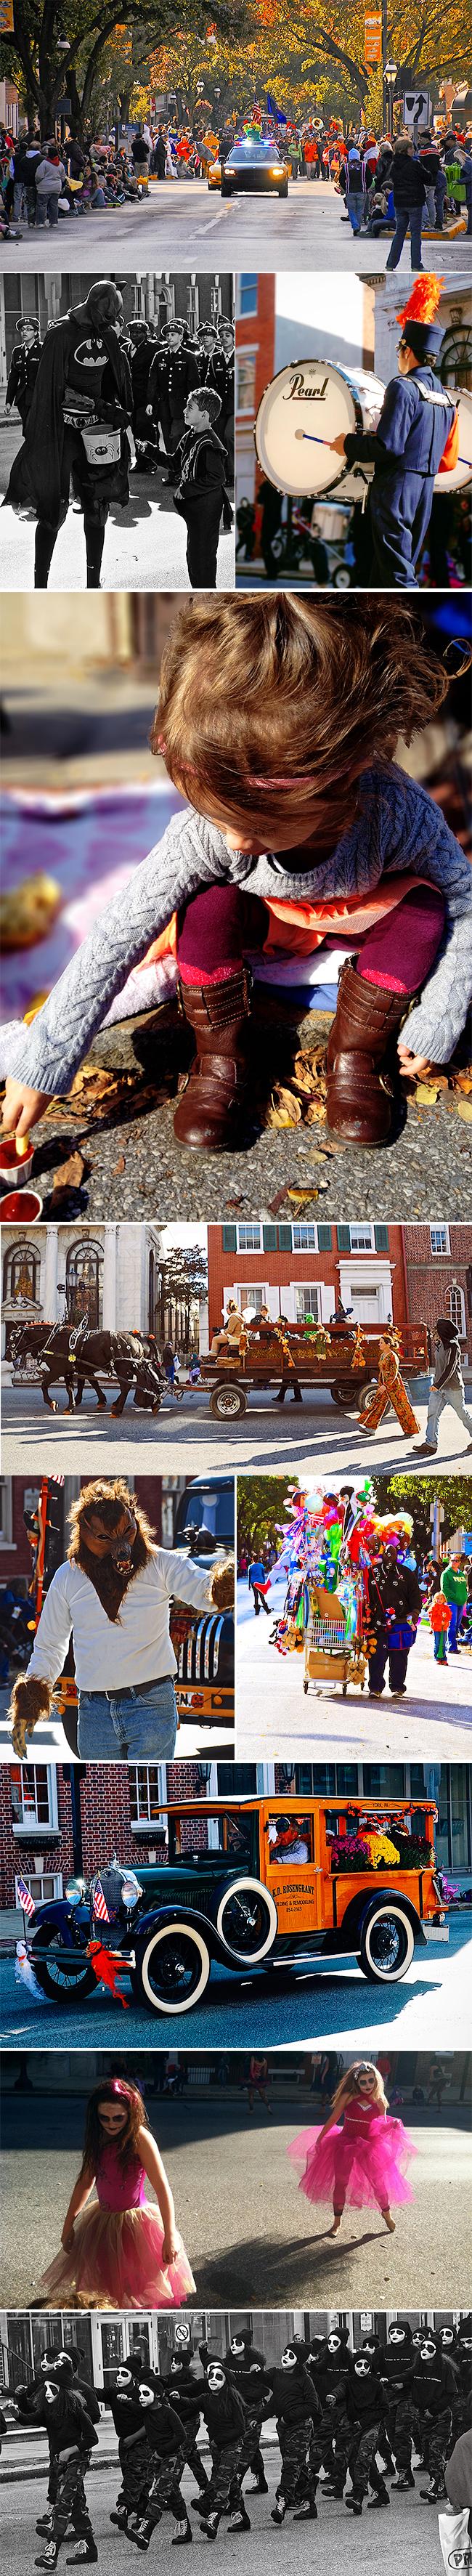 A-Lovely-Lark-Halloween-Parade-2013